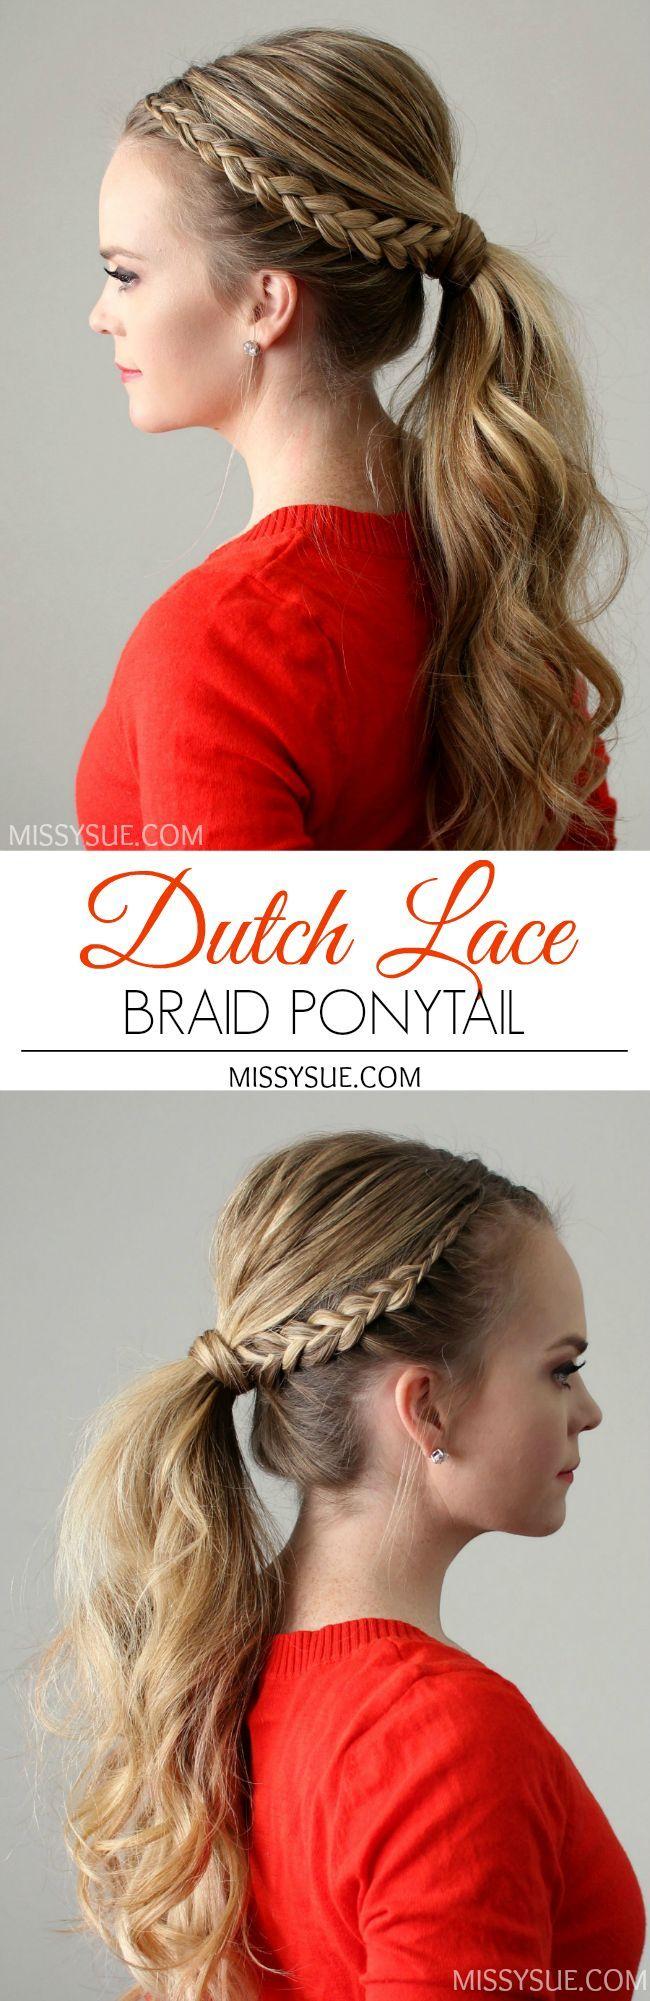 http://missysue.com/2015/10/dutch-lace-braid-ponytail/